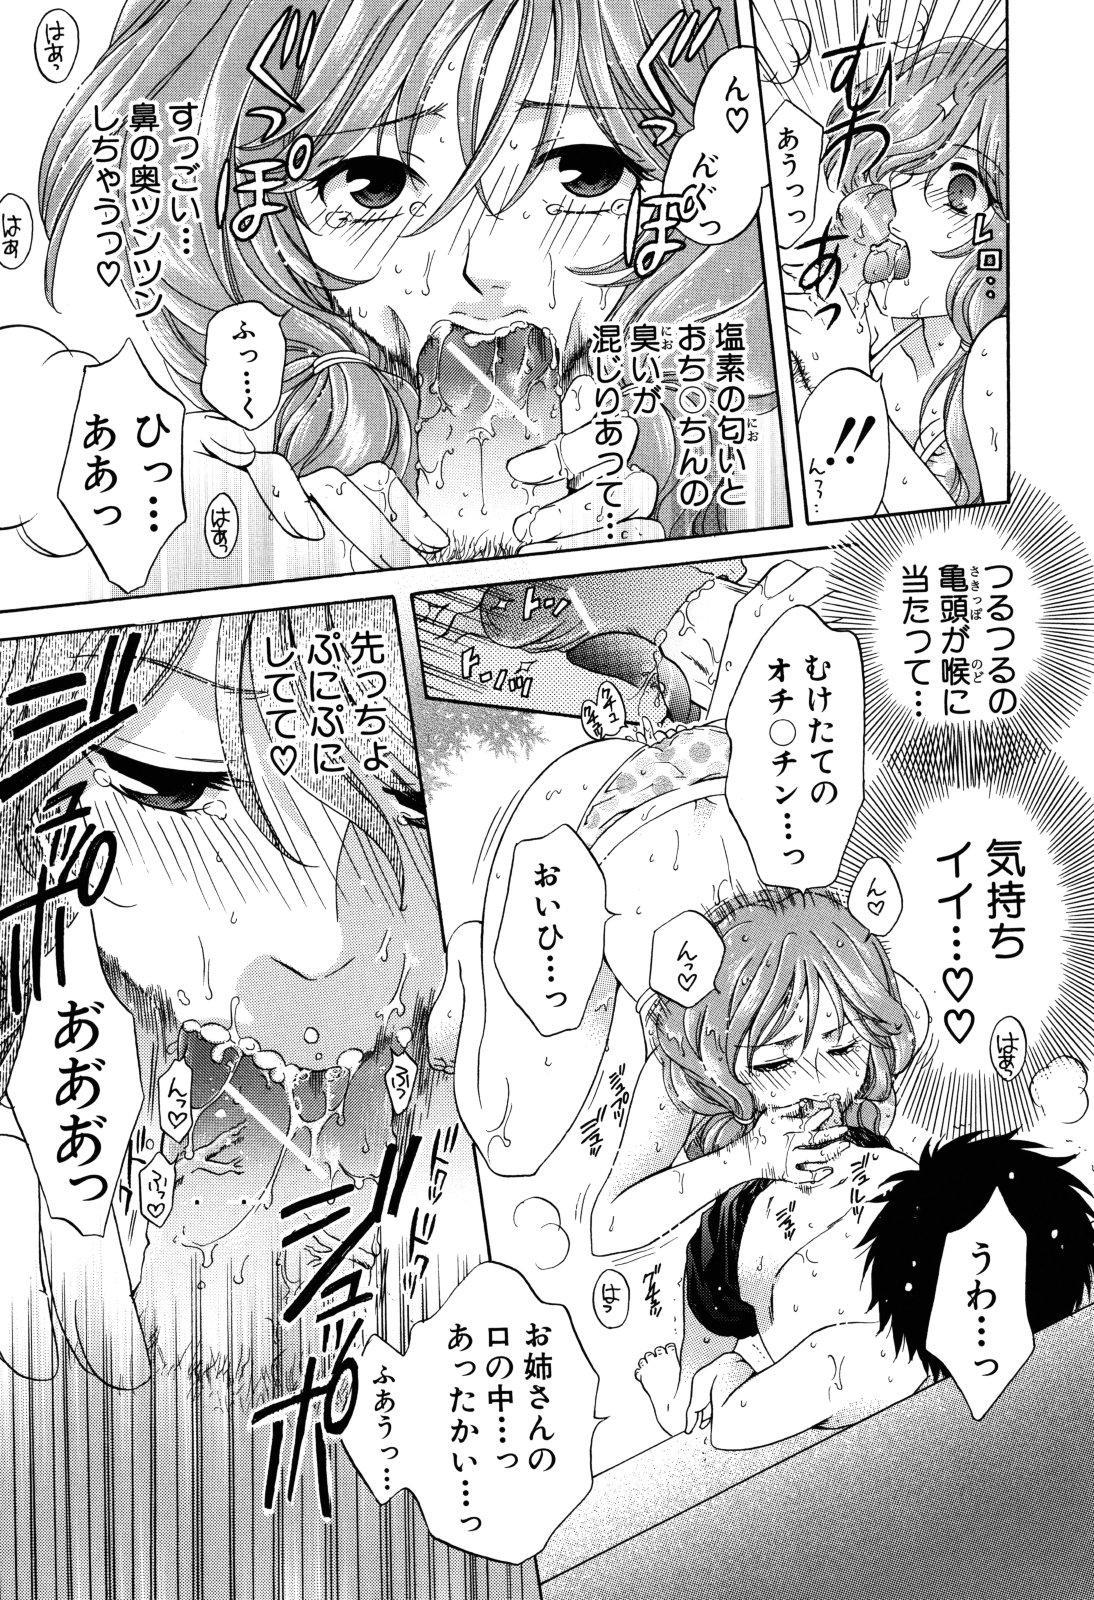 Kanojo ga Ochiru made - She in the depth 58